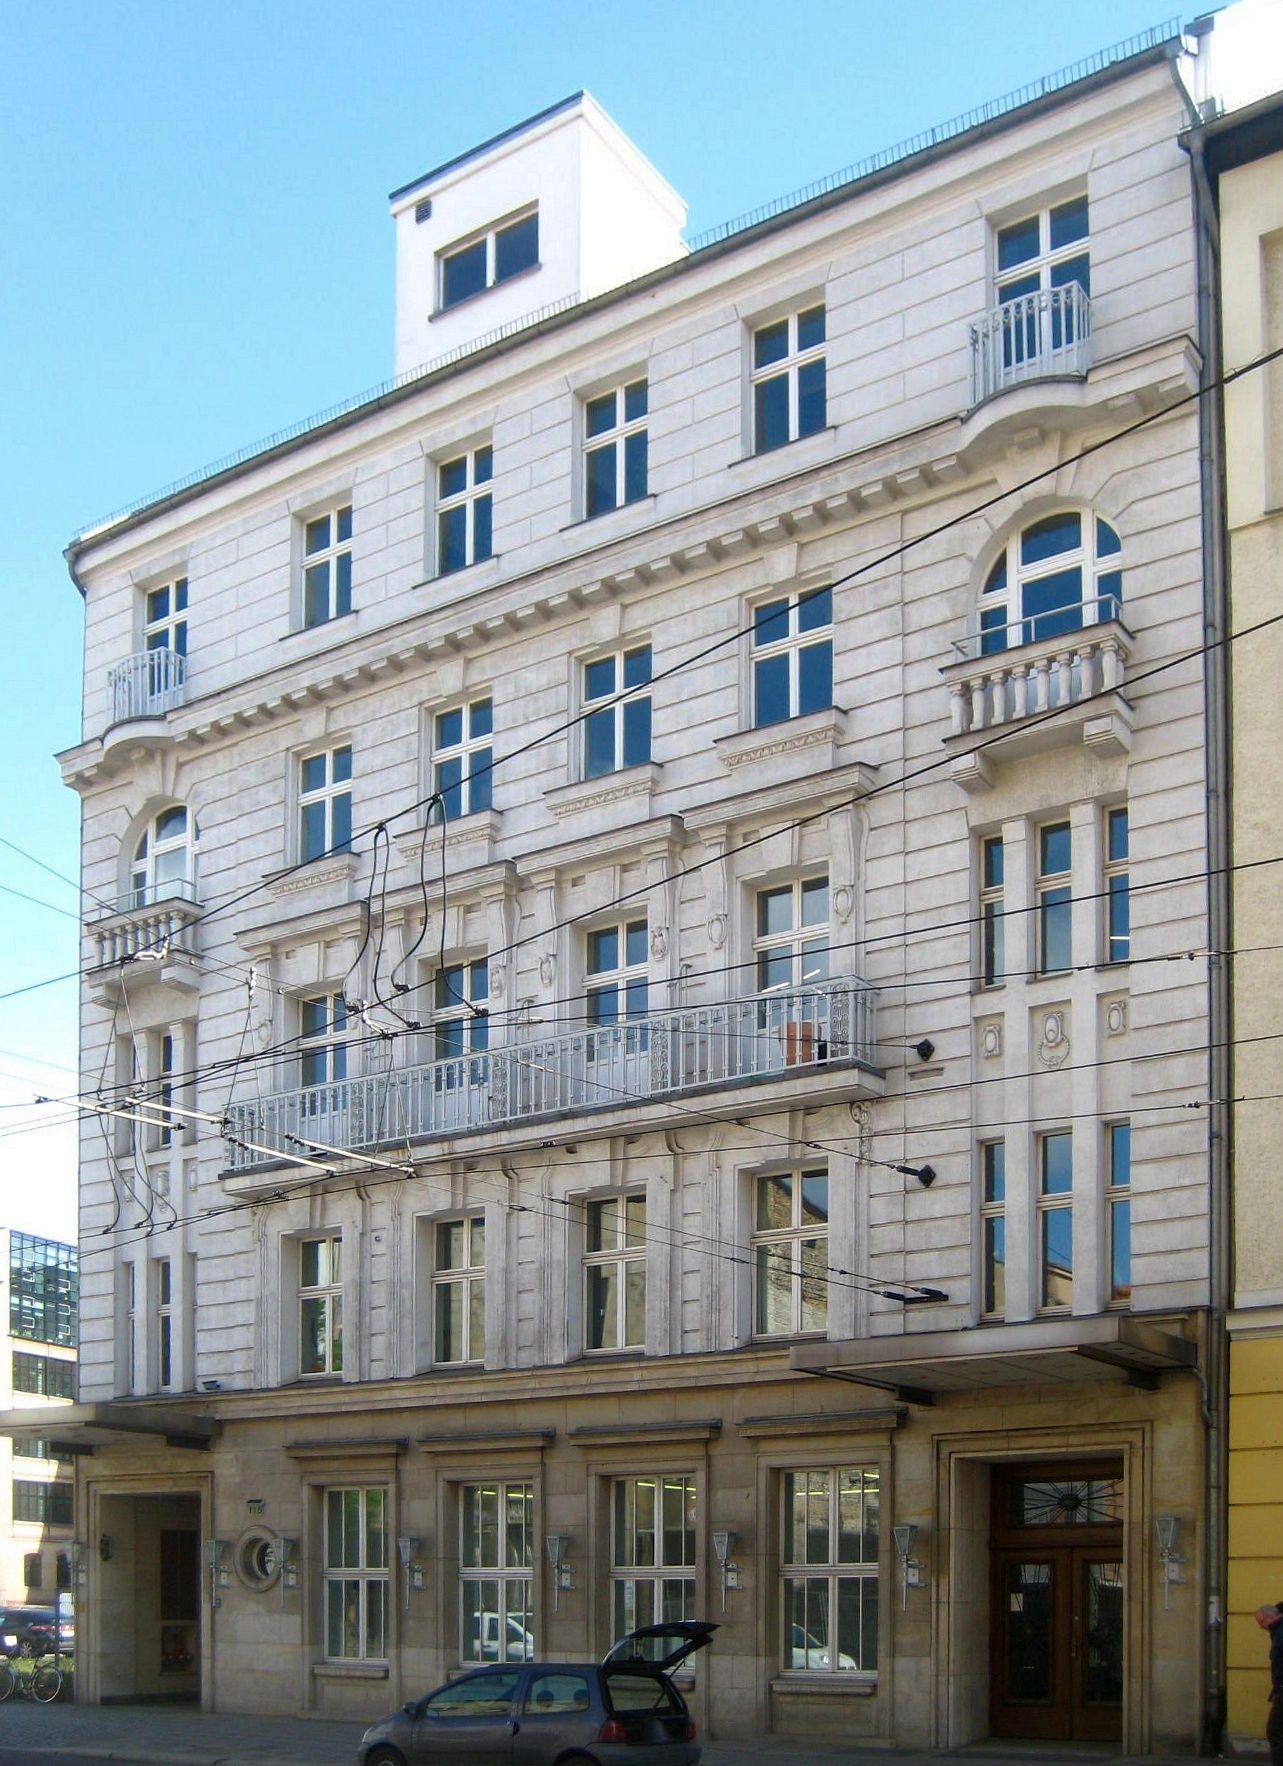 Ferienloft Berlin datei berlin mitte invalidenstrasse 115 hotel danziger hof jpg